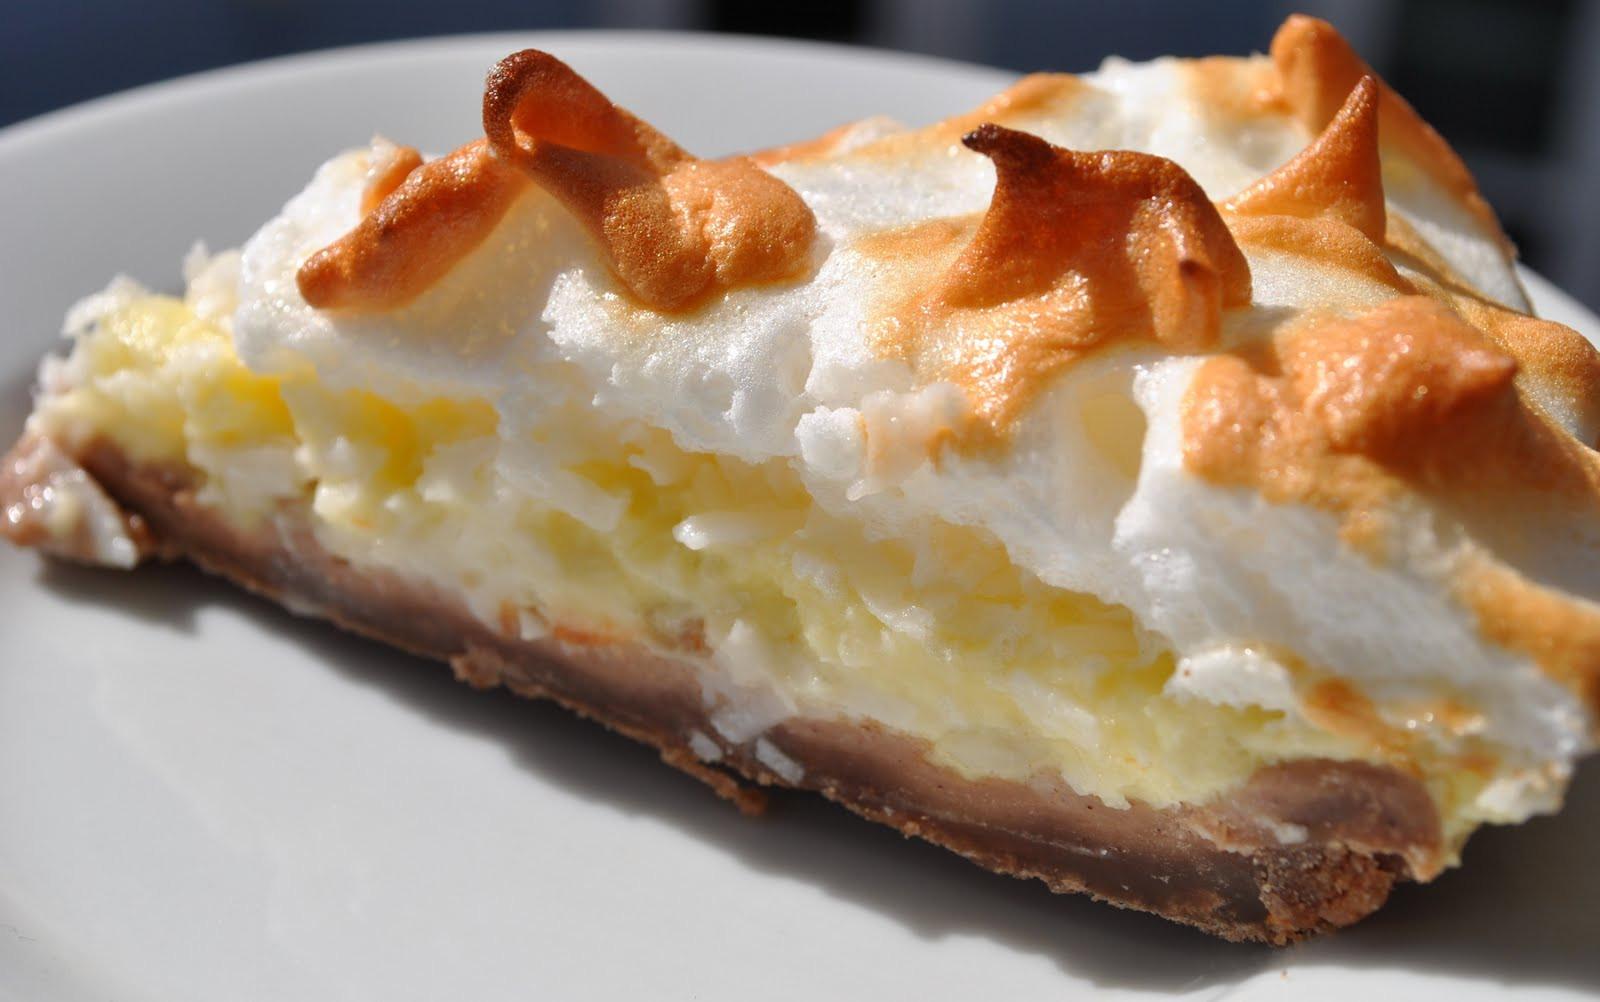 Coconut Cream Pie With Meringue  Baking Powders Coconut cream meringue pie